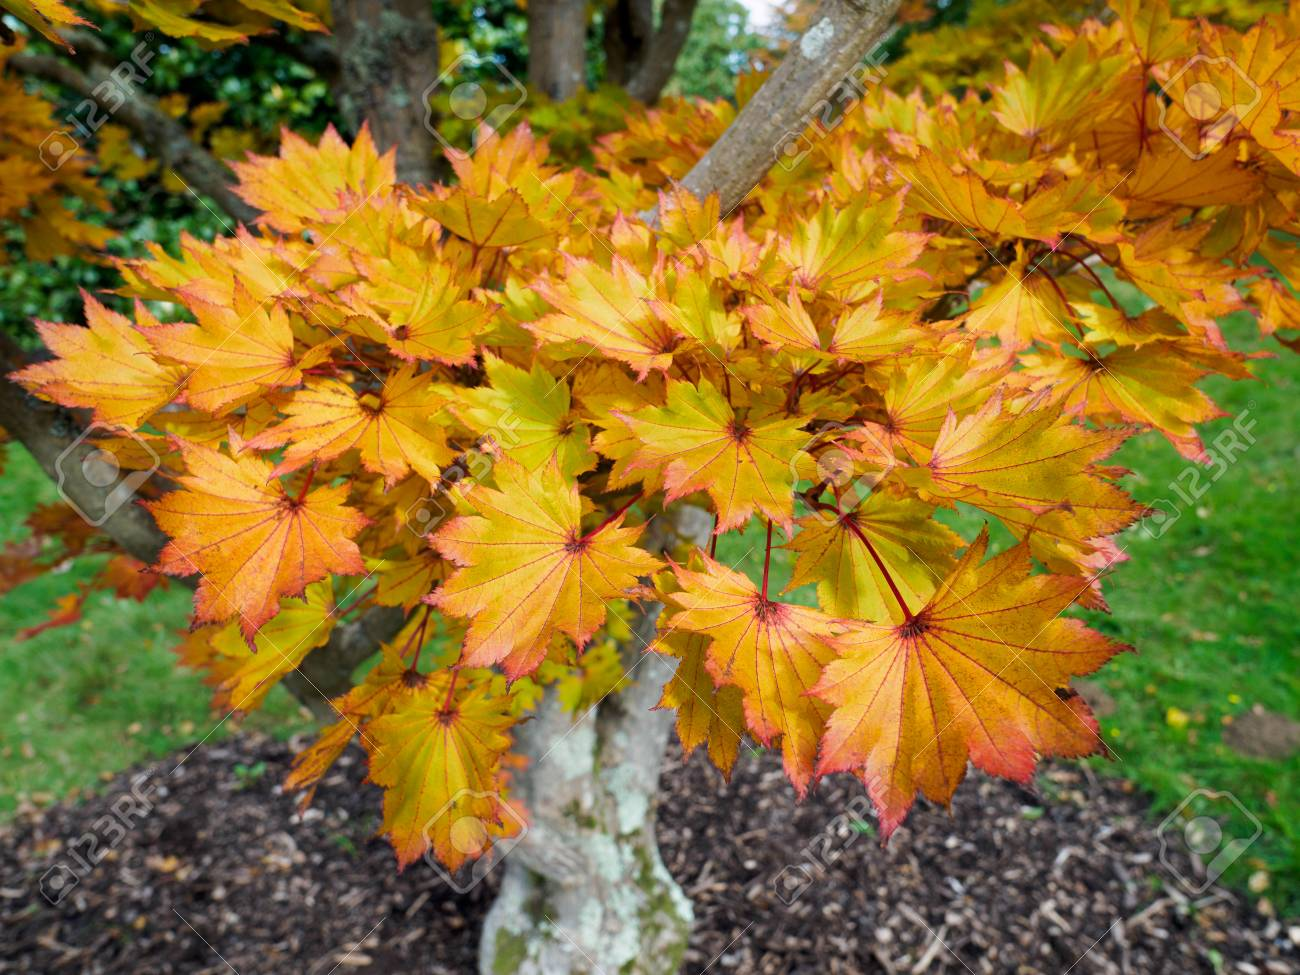 Acer Shirasawanum Cv Aureum In Autumn Colours Stock Photo Picture